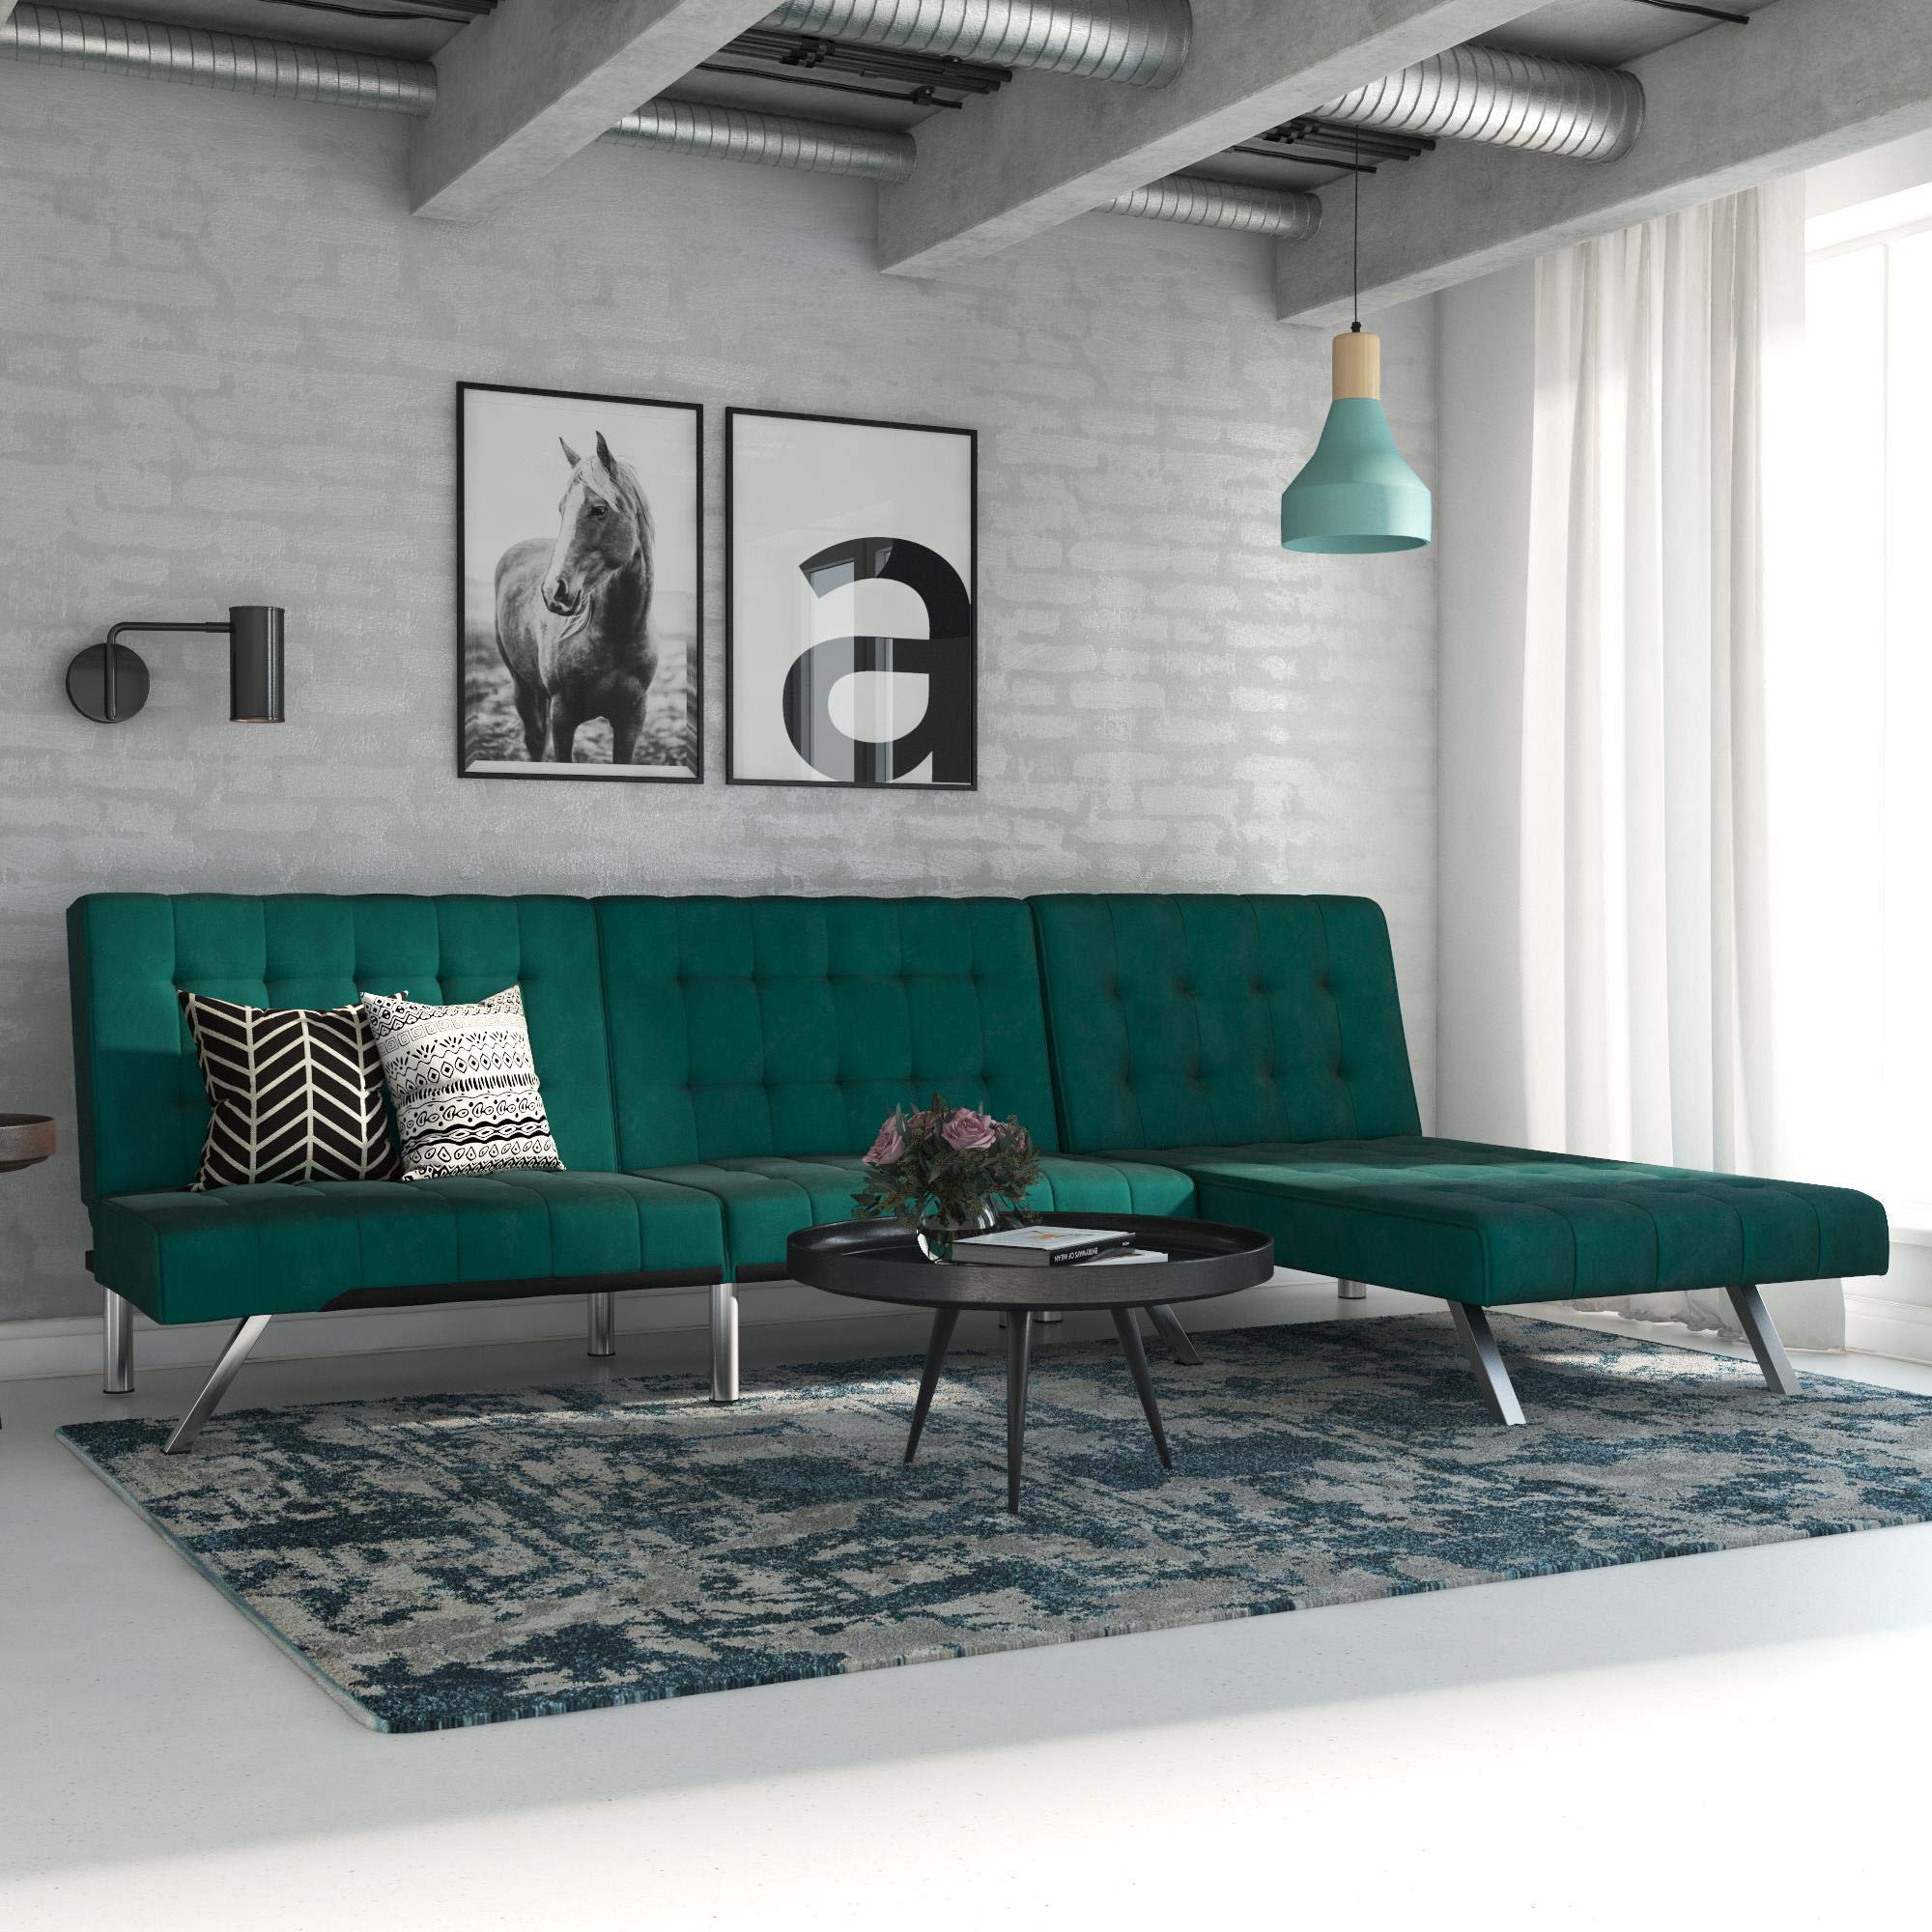 Astounding Dhp Emily Futon Sofa Bed Modern Couch Green Velvet Inzonedesignstudio Interior Chair Design Inzonedesignstudiocom